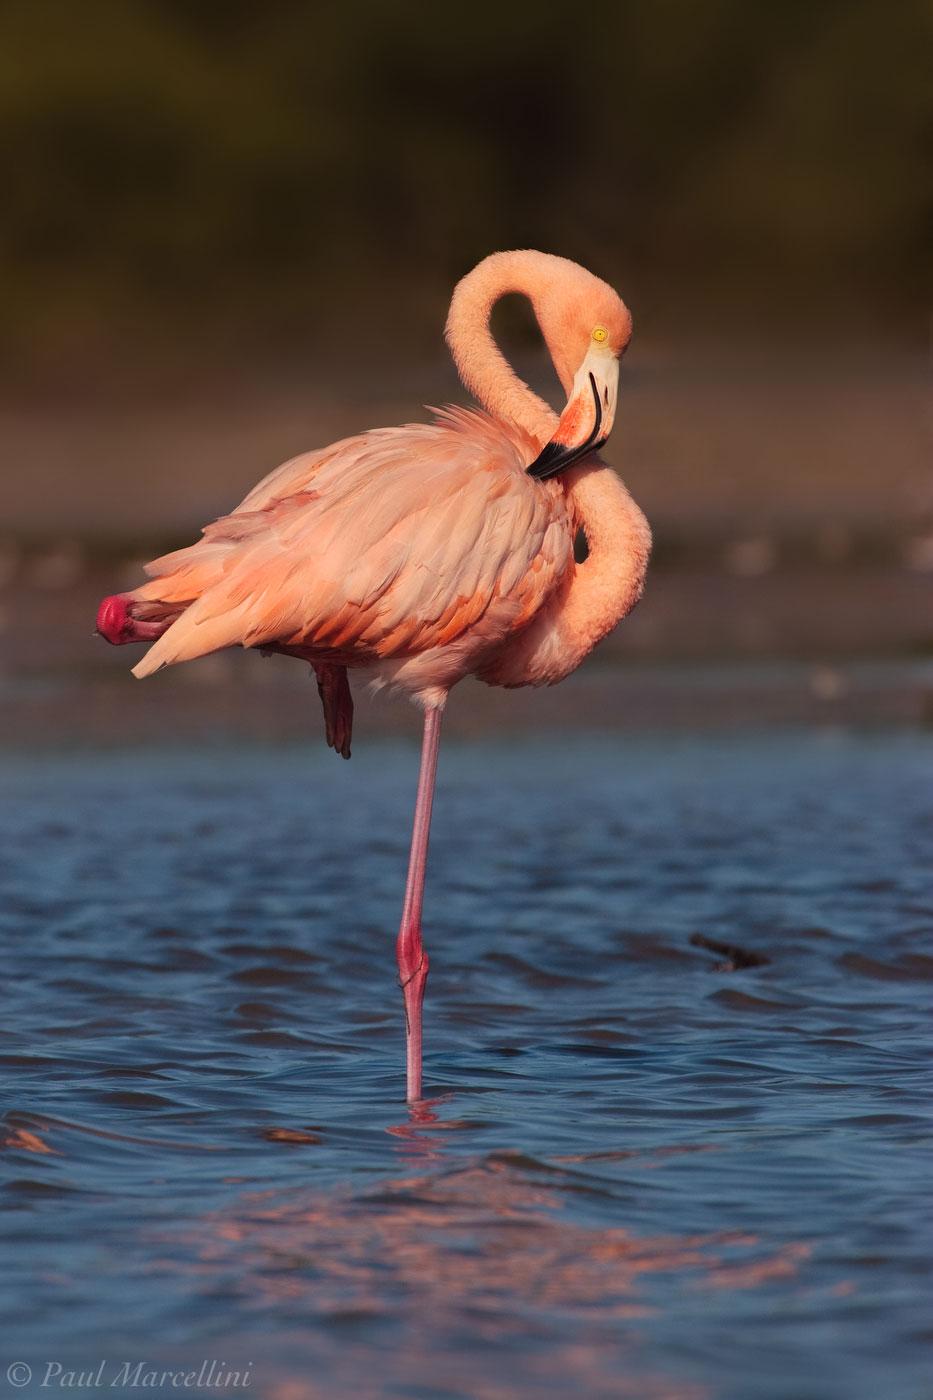 Phoenicopterus ruber, american flamingo, everglades national park, florida bay, photo